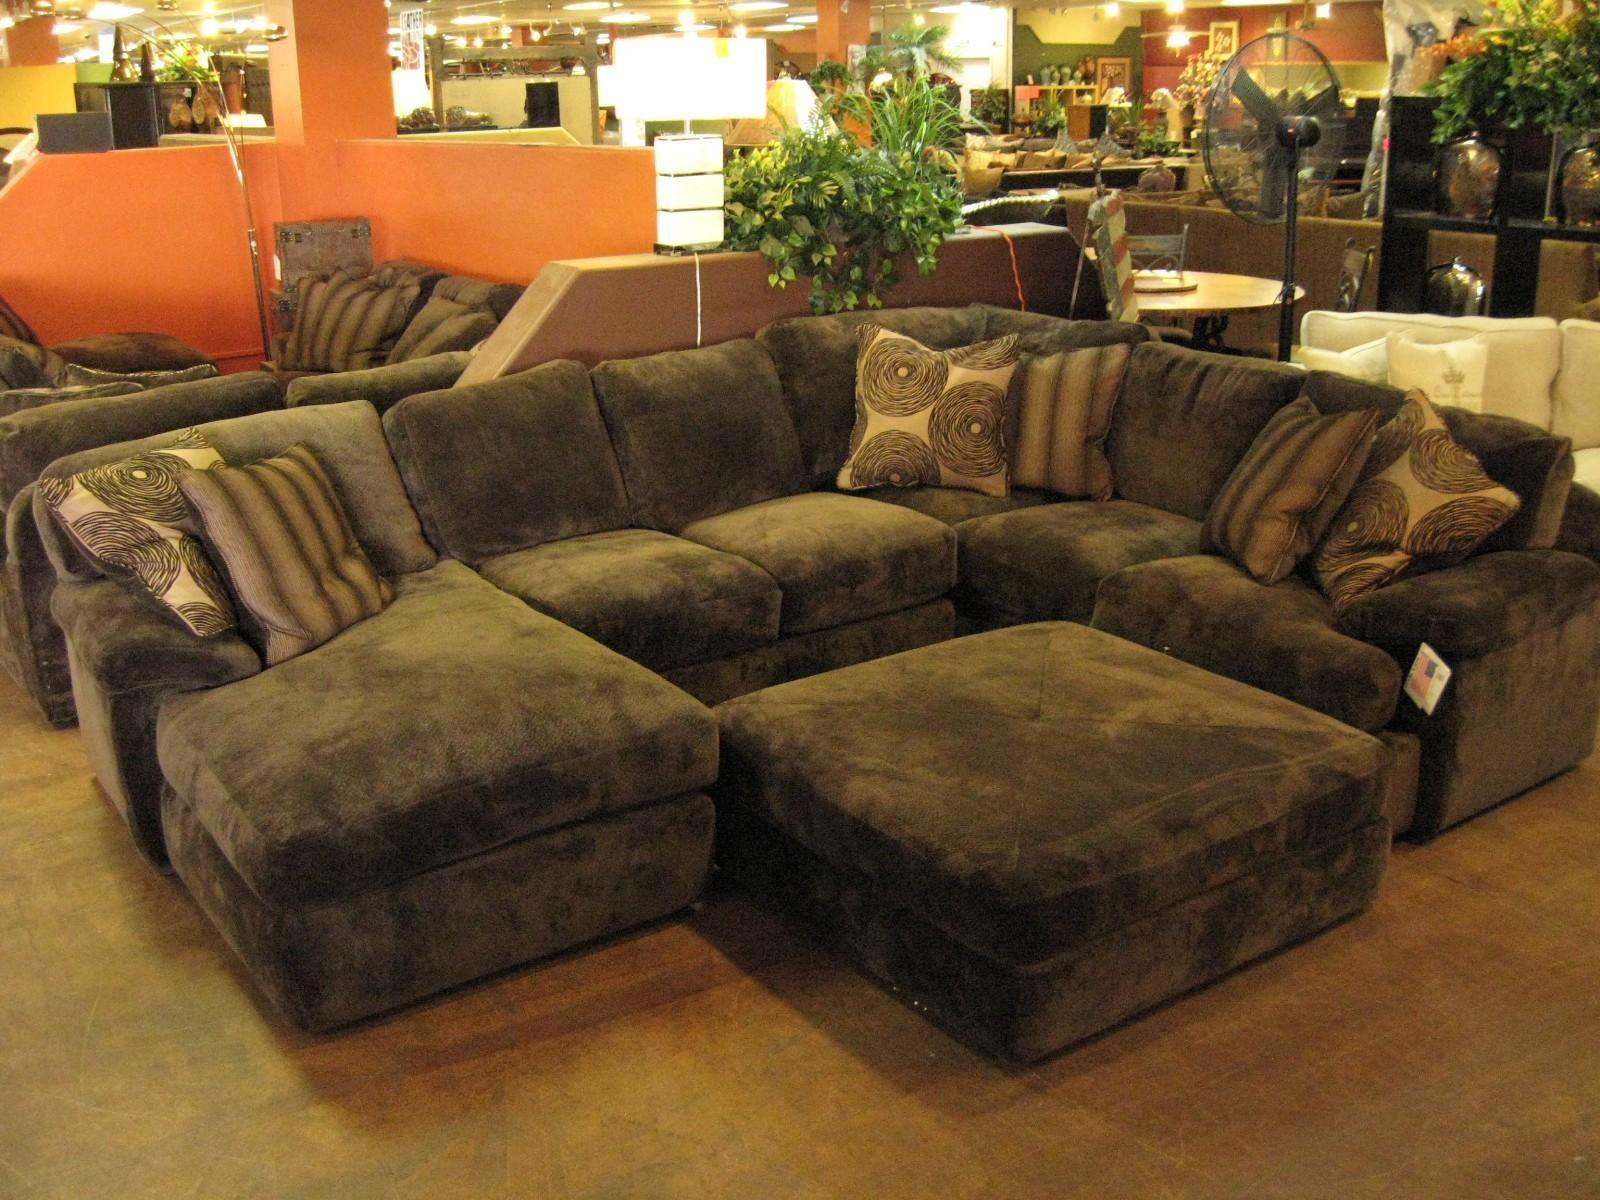 3Piece Modern Grey Microfiber Reversible Sectional Sofa With Large for Sectional Sofa With Large Ottoman